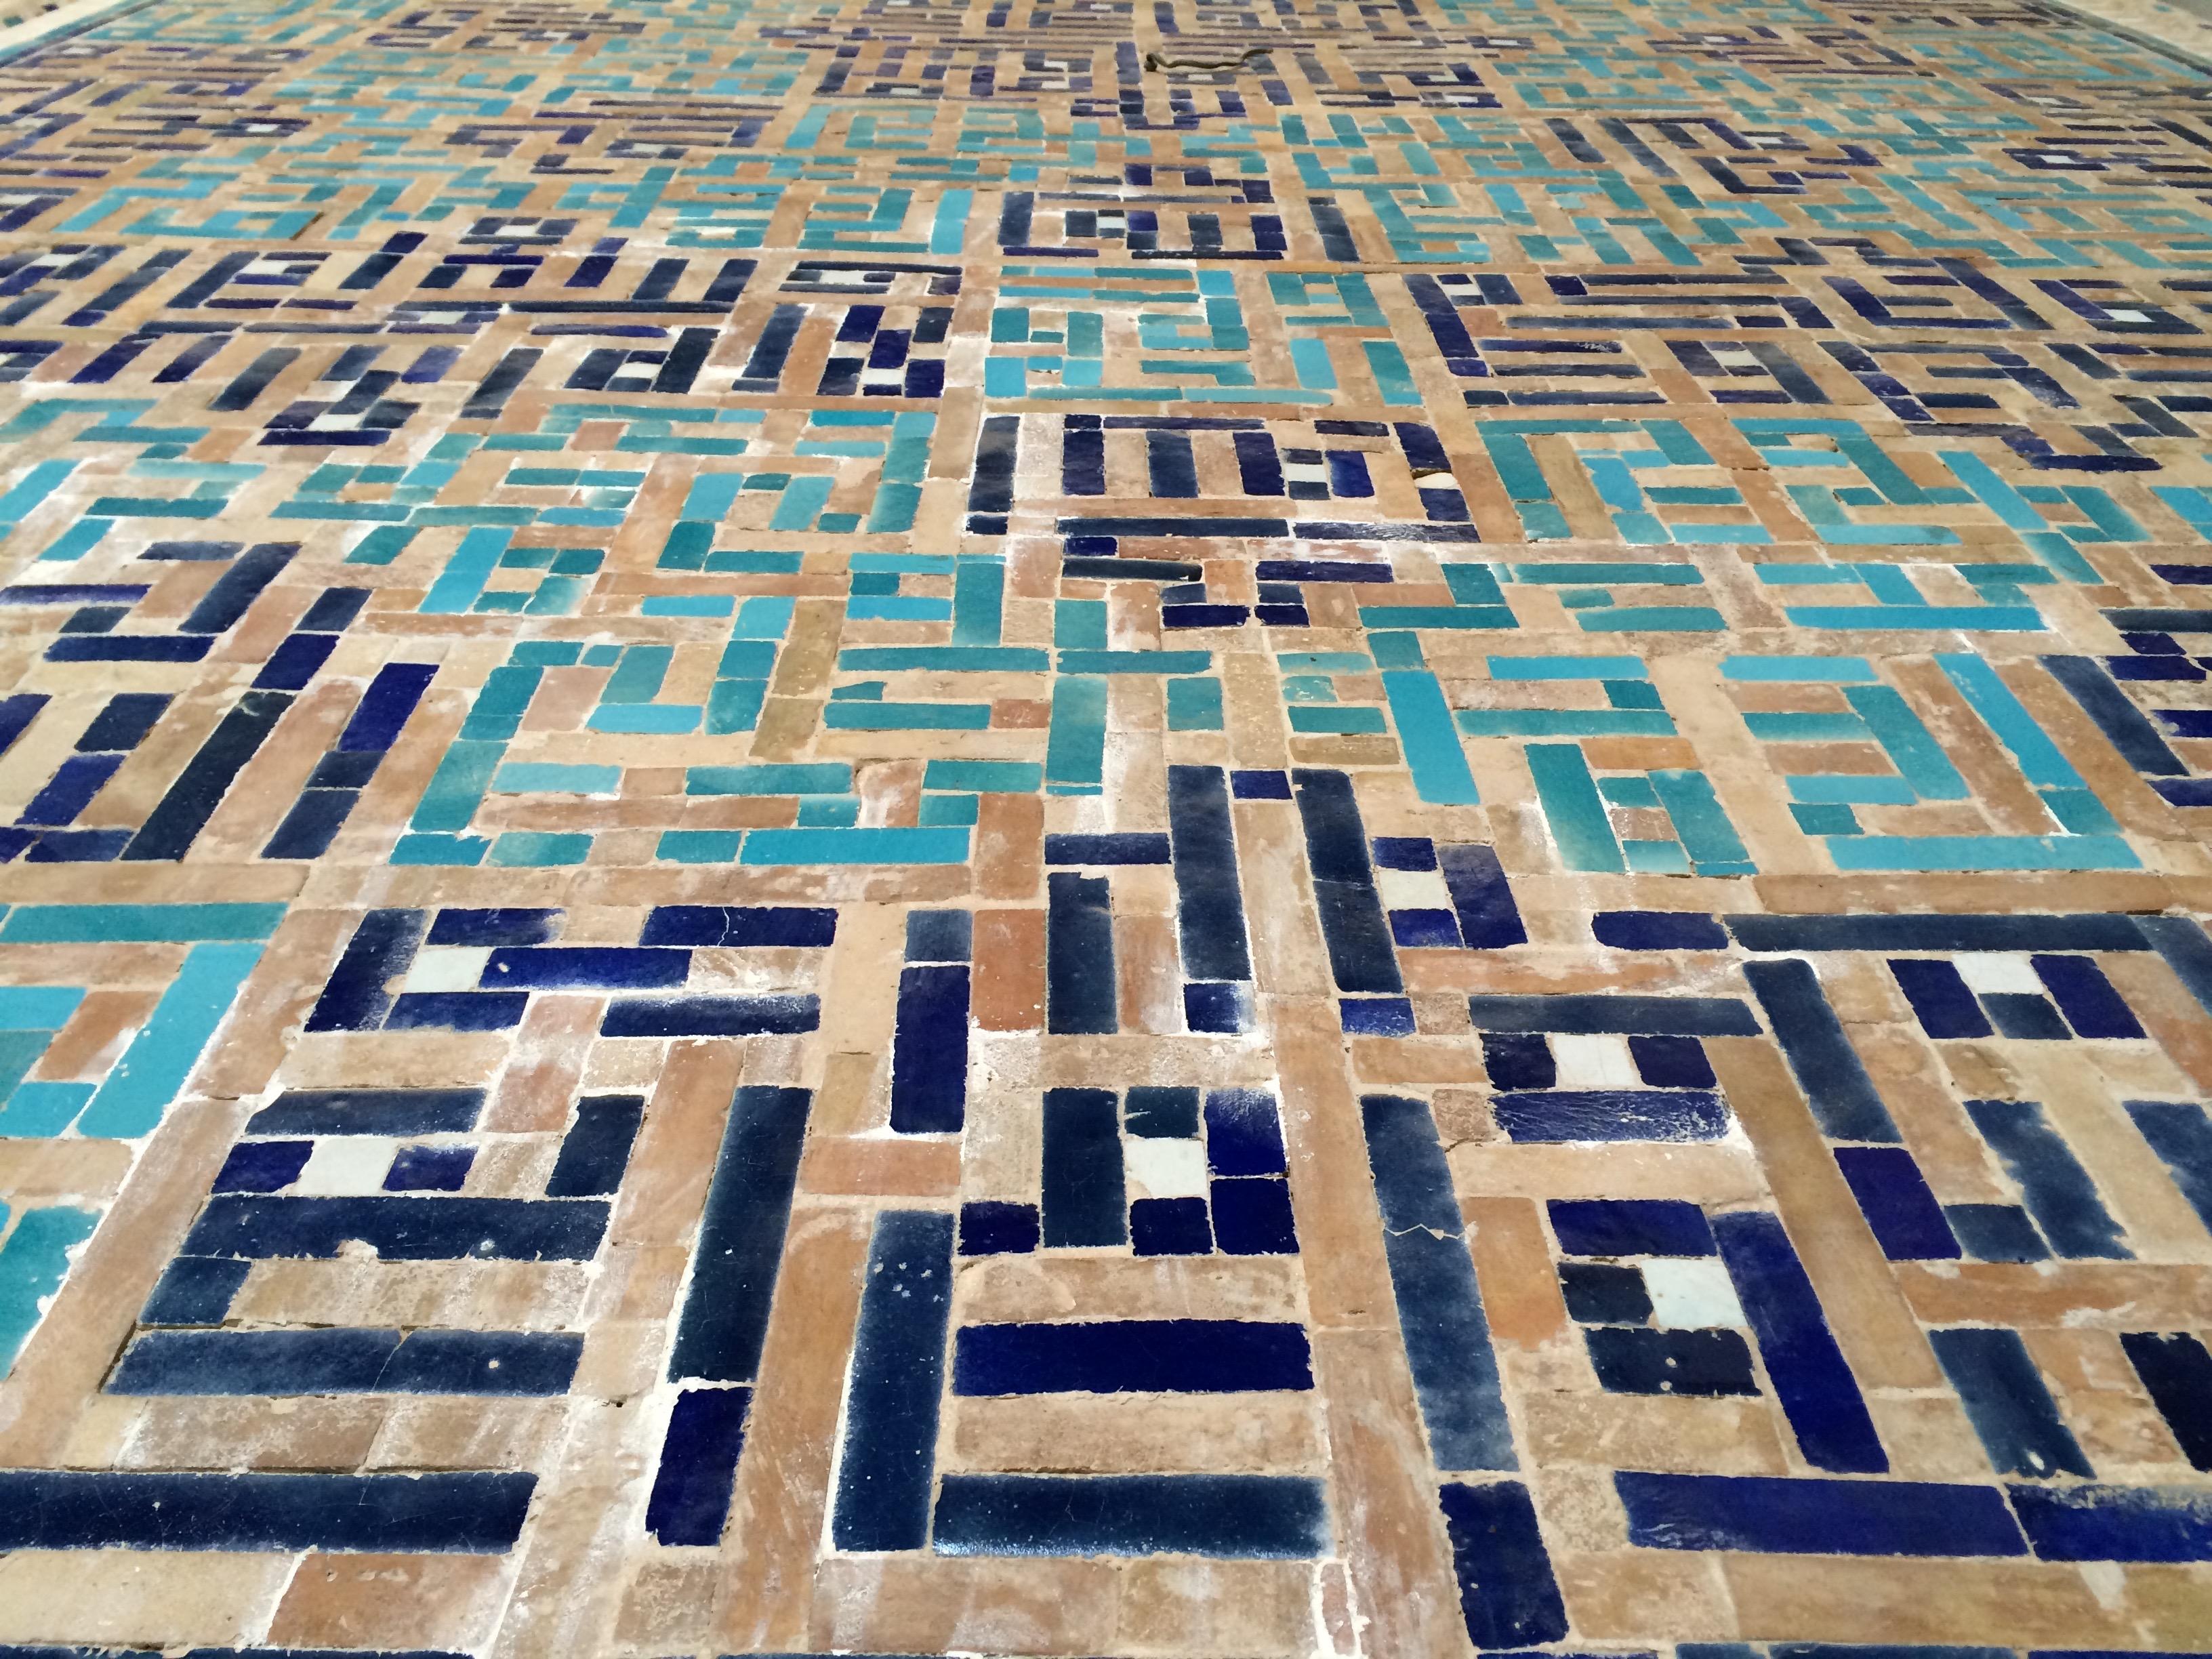 Heirloom Tech: The Ancient Pixels of Banna'i Brickwork